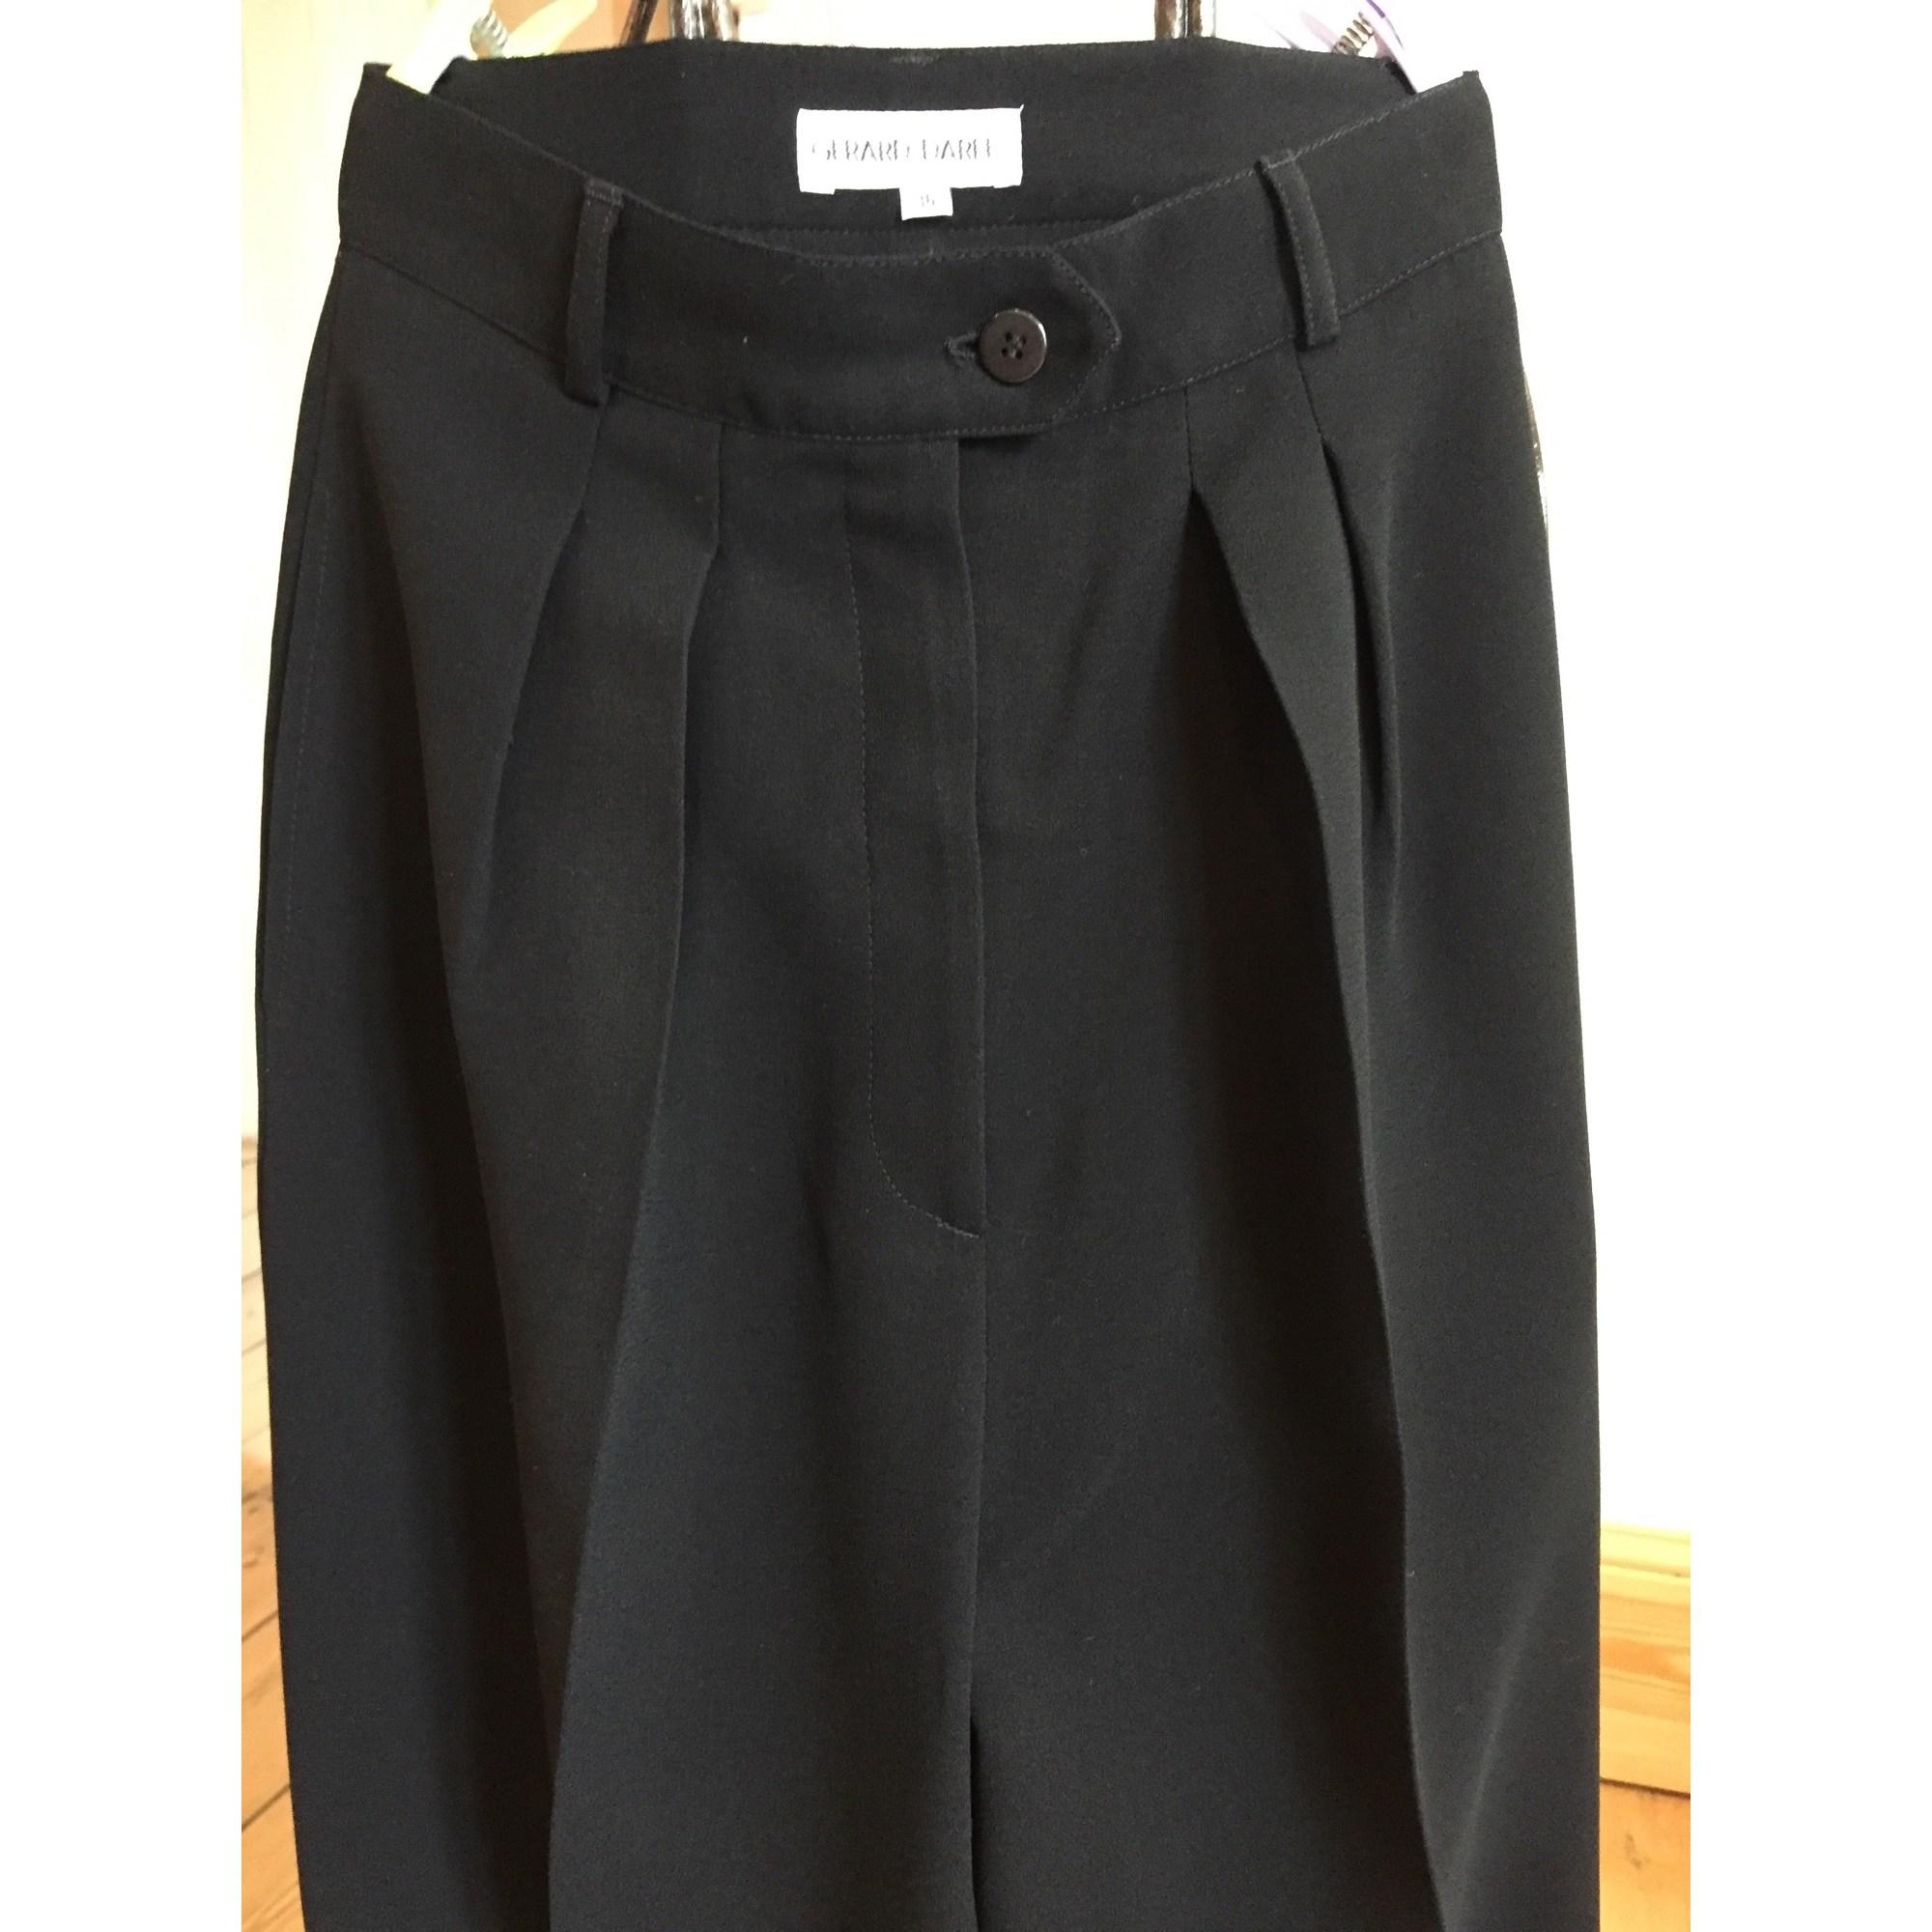 124a55f29dee Pantalon carotte GERARD DAREL 36 (S